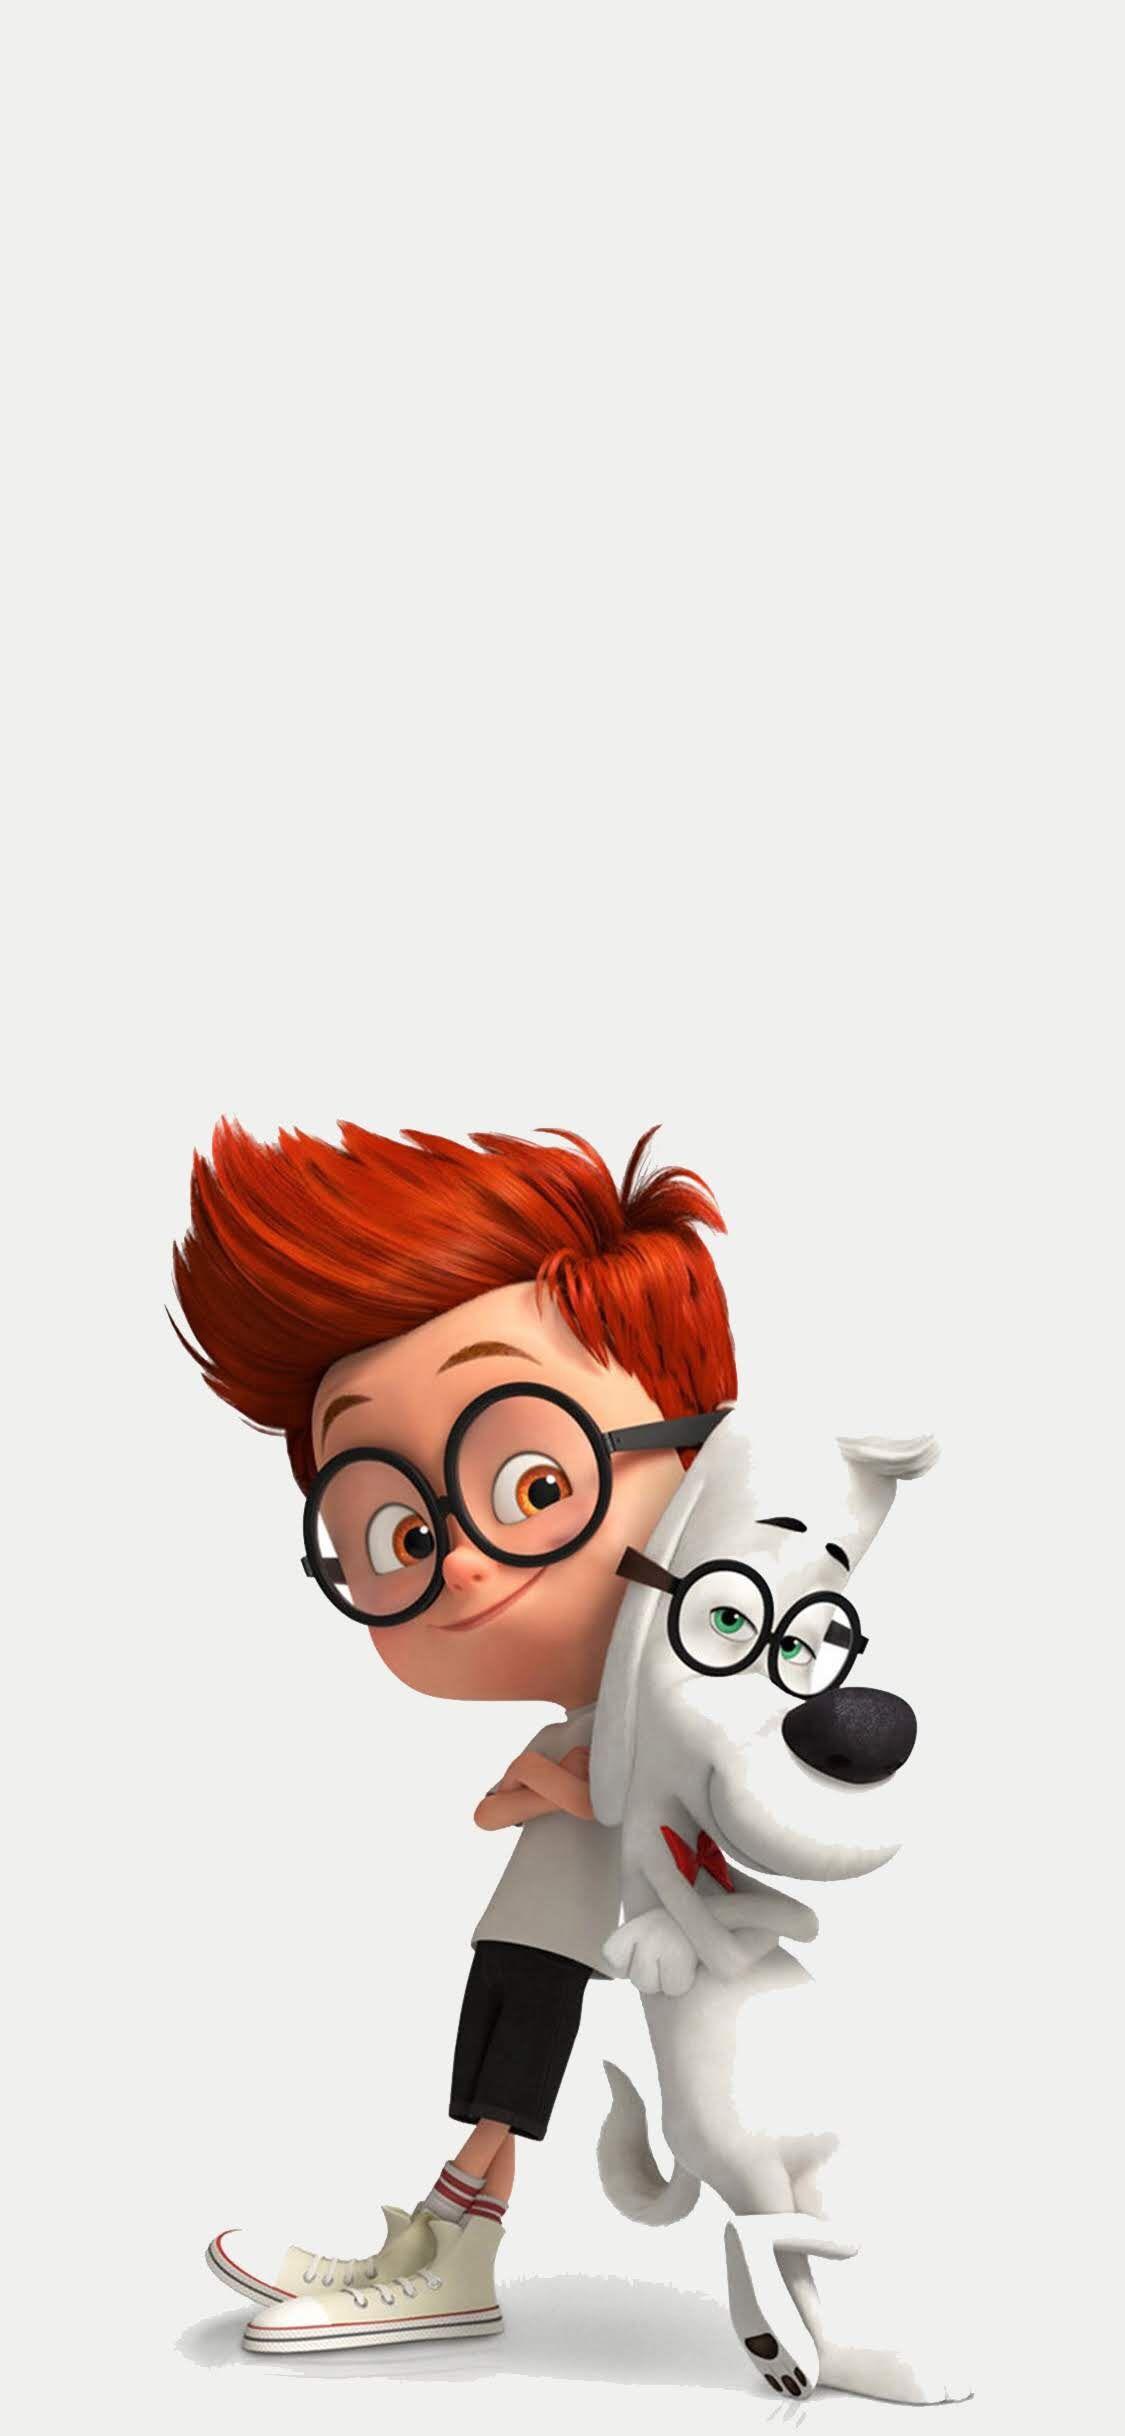 Mr Peabody And Sherman Cute Cartoon Pictures Cartoon Character Design Cute Cartoon Wallpapers